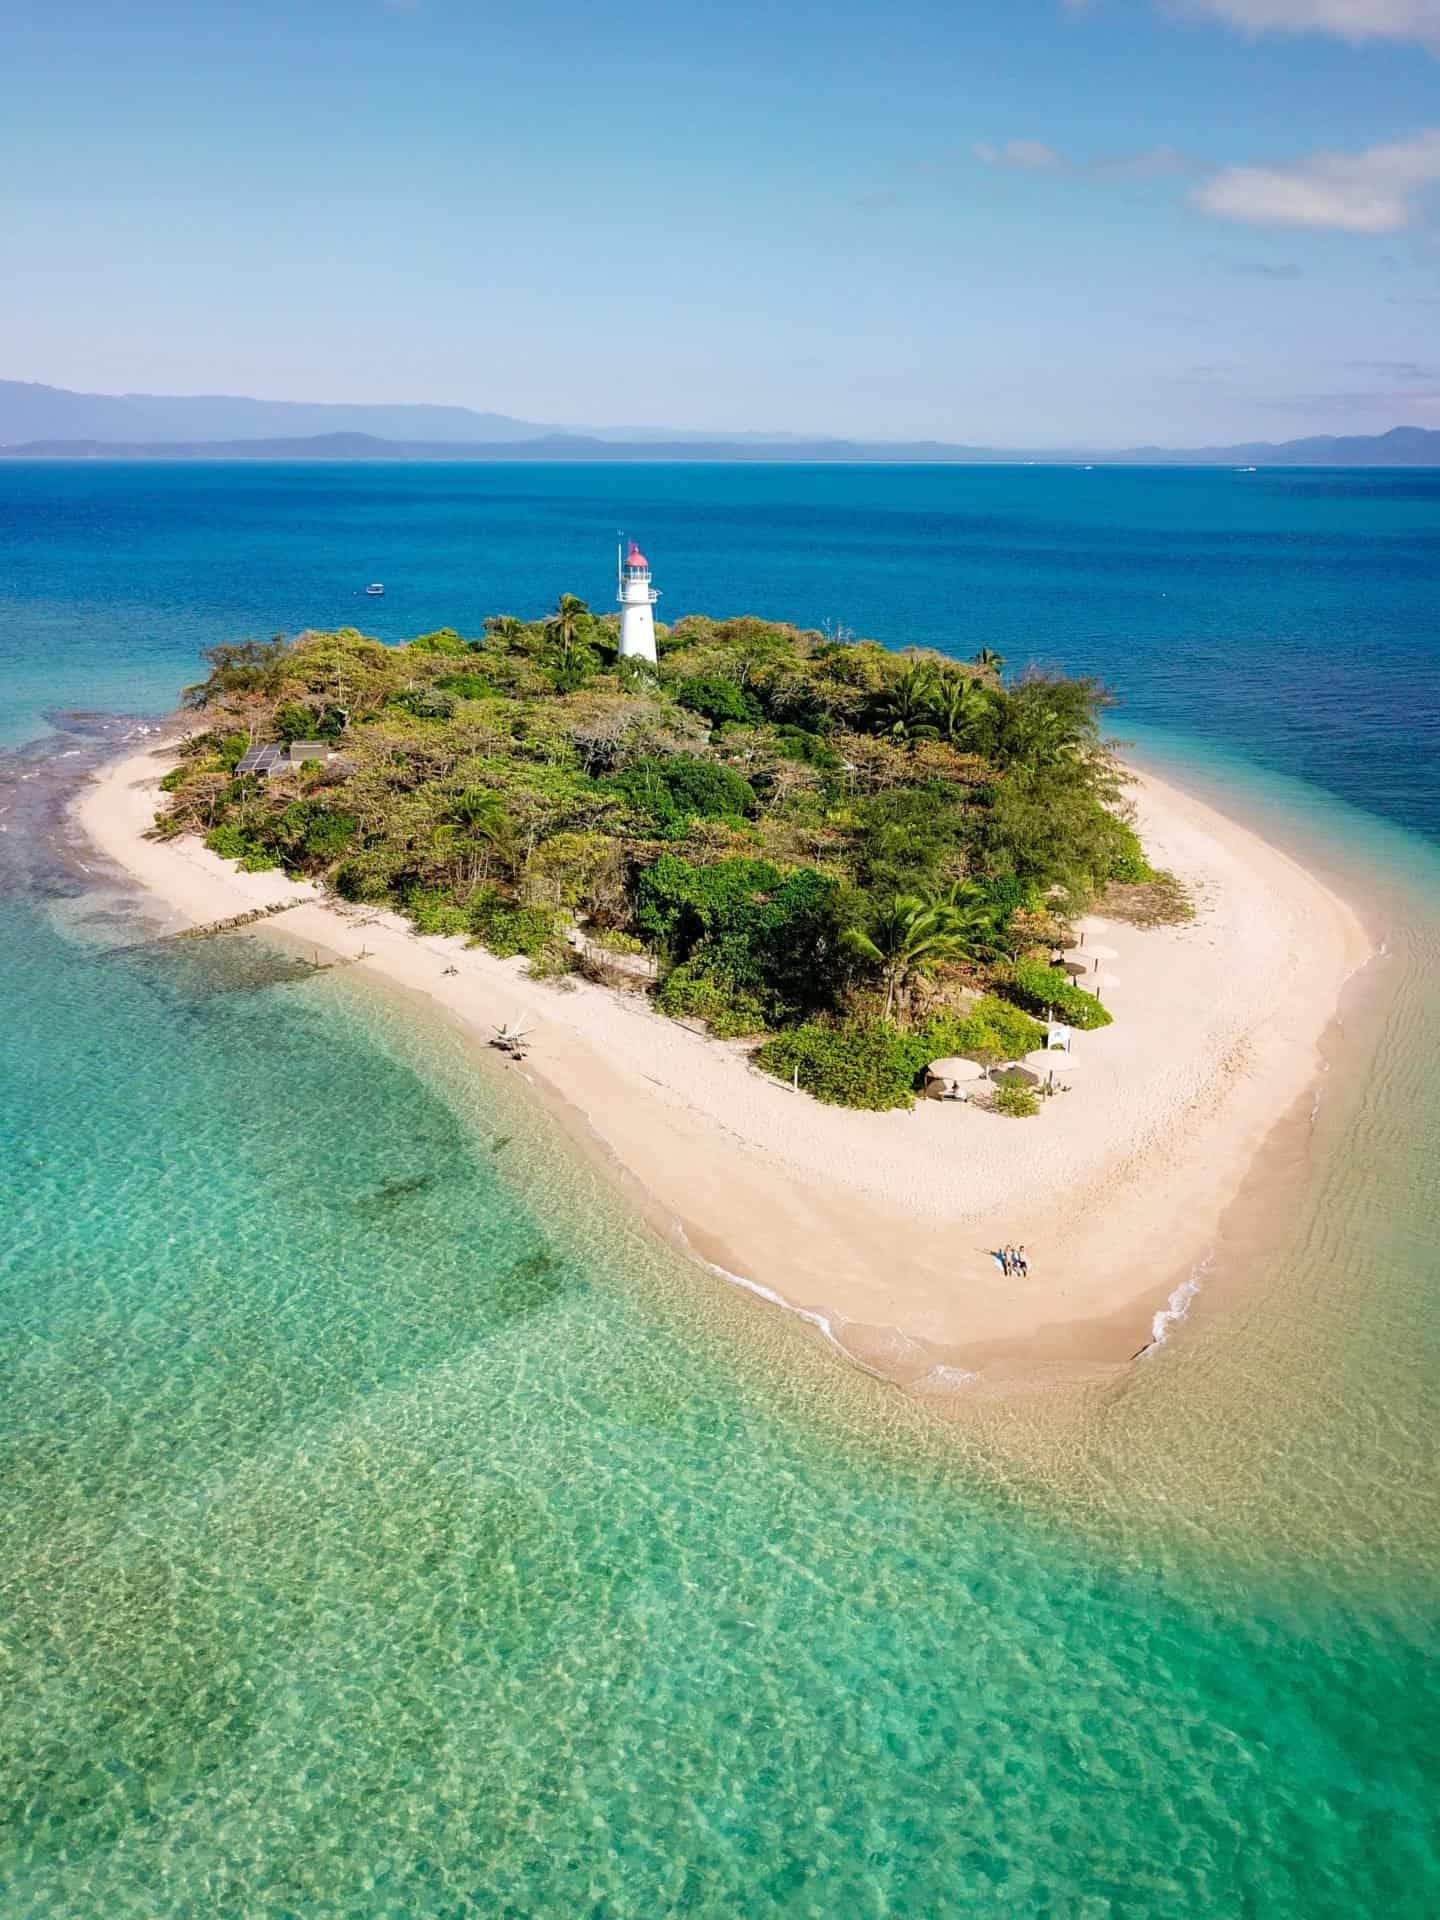 Aerial photo of Low Isles, Port Douglas